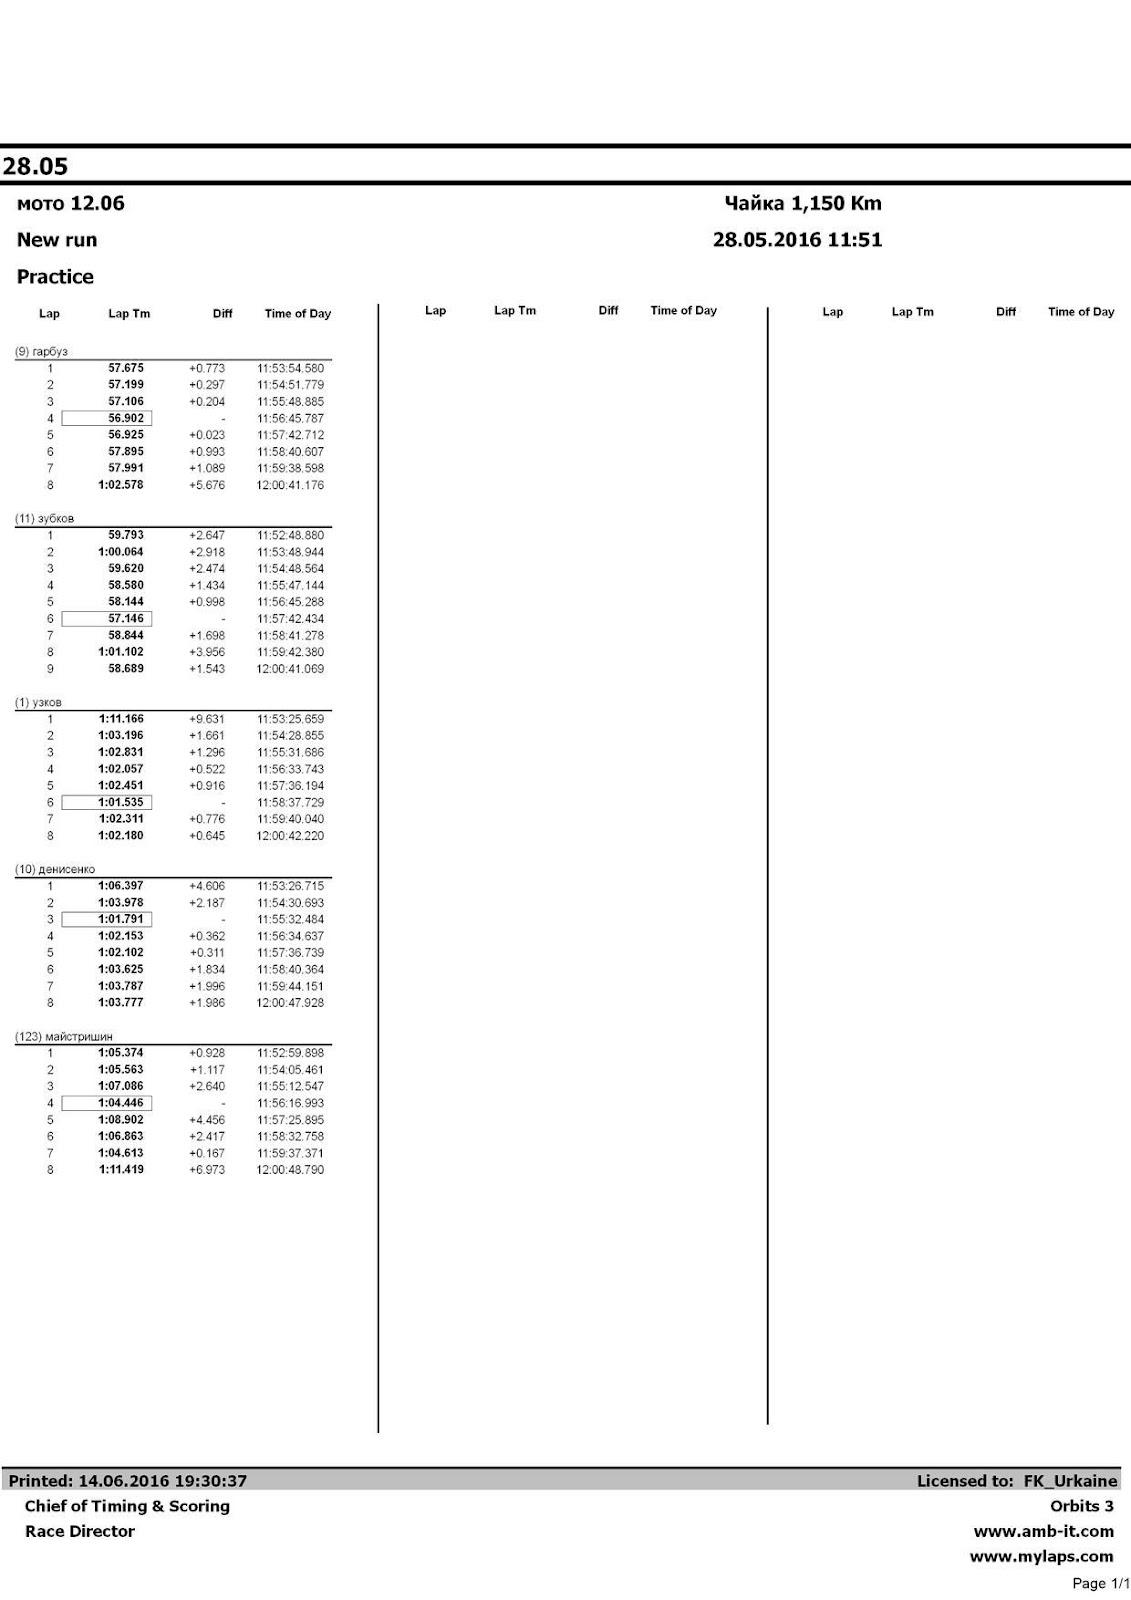 Автоматически созданный замещающий текст: Lap Lap Tm Diff Time of Day Lap Lap Tm Diff Time of Day Lap (9) гарбуз 1 2 3 4 5 6 7 8 (11) зубков 1 2 3 4 5 6 7 8 9 (1) узков 1 2 3 4 5 6 7 8 (10) денисенко 1 2 3 4 5 6 7 8 (123) майстришин 1 2 3 4 5 6 7 8 Lap Tm 57.675 57.199 57.106 56.902 56.925 57.895 57.991 1:02.578 59.793 1:00.064 59.620 58.580 58.144 57.146 58.844 1:01.102 58.689 1:11.166 1:03.196 1:02.831 1:02.057 1:02.451 1:01.535 1:02.311 1:02.180 1:06.397 1:03.978 1:01.791 1:02.153 1:02.102 1:03.625 1:03.787 1:03.777 1:05.374 1:05.563 1:07.086 1:04.446 1:08.902 1:06.863 1:04.613 1:11.419 Diff +0.773 +0.297 +0.204 - +0.023 +0.993 +1.089 +5.676 +2.647 +2.918 +2.474 +1.434 +0.998 - +1.698 +3.956 +1.543 +9.631 +1.661 +1.296 +0.522 +0.916 - +0.776 +0.645 +4.606 +2.187 - +0.362 +0.311 +1.834 +1.996 +1.986 +0.928 +1.117 +2.640 - +4.456 +2.417 +0.167 +6.973 Time of Day 11:53:54.580 11:54:51.779 11:55:48.885 11:56:45.787 11:57:42.712 11:58:40.607 11:59:38.598 12:00:41.176 11:52:48.880 11:53:48.944 11:54:48.564 11:55:47.144 11:56:45.288 11:57:42.434 11:58:41.278 11:59:42.380 12:00:41.069 11:53:25.659 11:54:28.855 11:55:31.686 11:56:33.743 11:57:36.194 11:58:37.729 11:59:40.040 12:00:42.220 11:53:26.715 11:54:30.693 11:55:32.484 11:56:34.637 11:57:36.739 11:58:40.364 11:59:44.151 12:00:47.928 11:52:59.898 11:54:05.461 11:55:12.547 11:56:16.993 11:57:25.895 11:58:32.758 11:59:37.371 12:00:48.790 28.05 мото 12.06 New run Practice Чайка 1,150 Km 28.05.2016 11:51 Printed: 14.06.2016 19:30:37 Chief of Timing & Scoring Race Director Licensed to: FK_Urkaine Orbits 3 www.amb-it.com www.mylaps.com Page 1/1